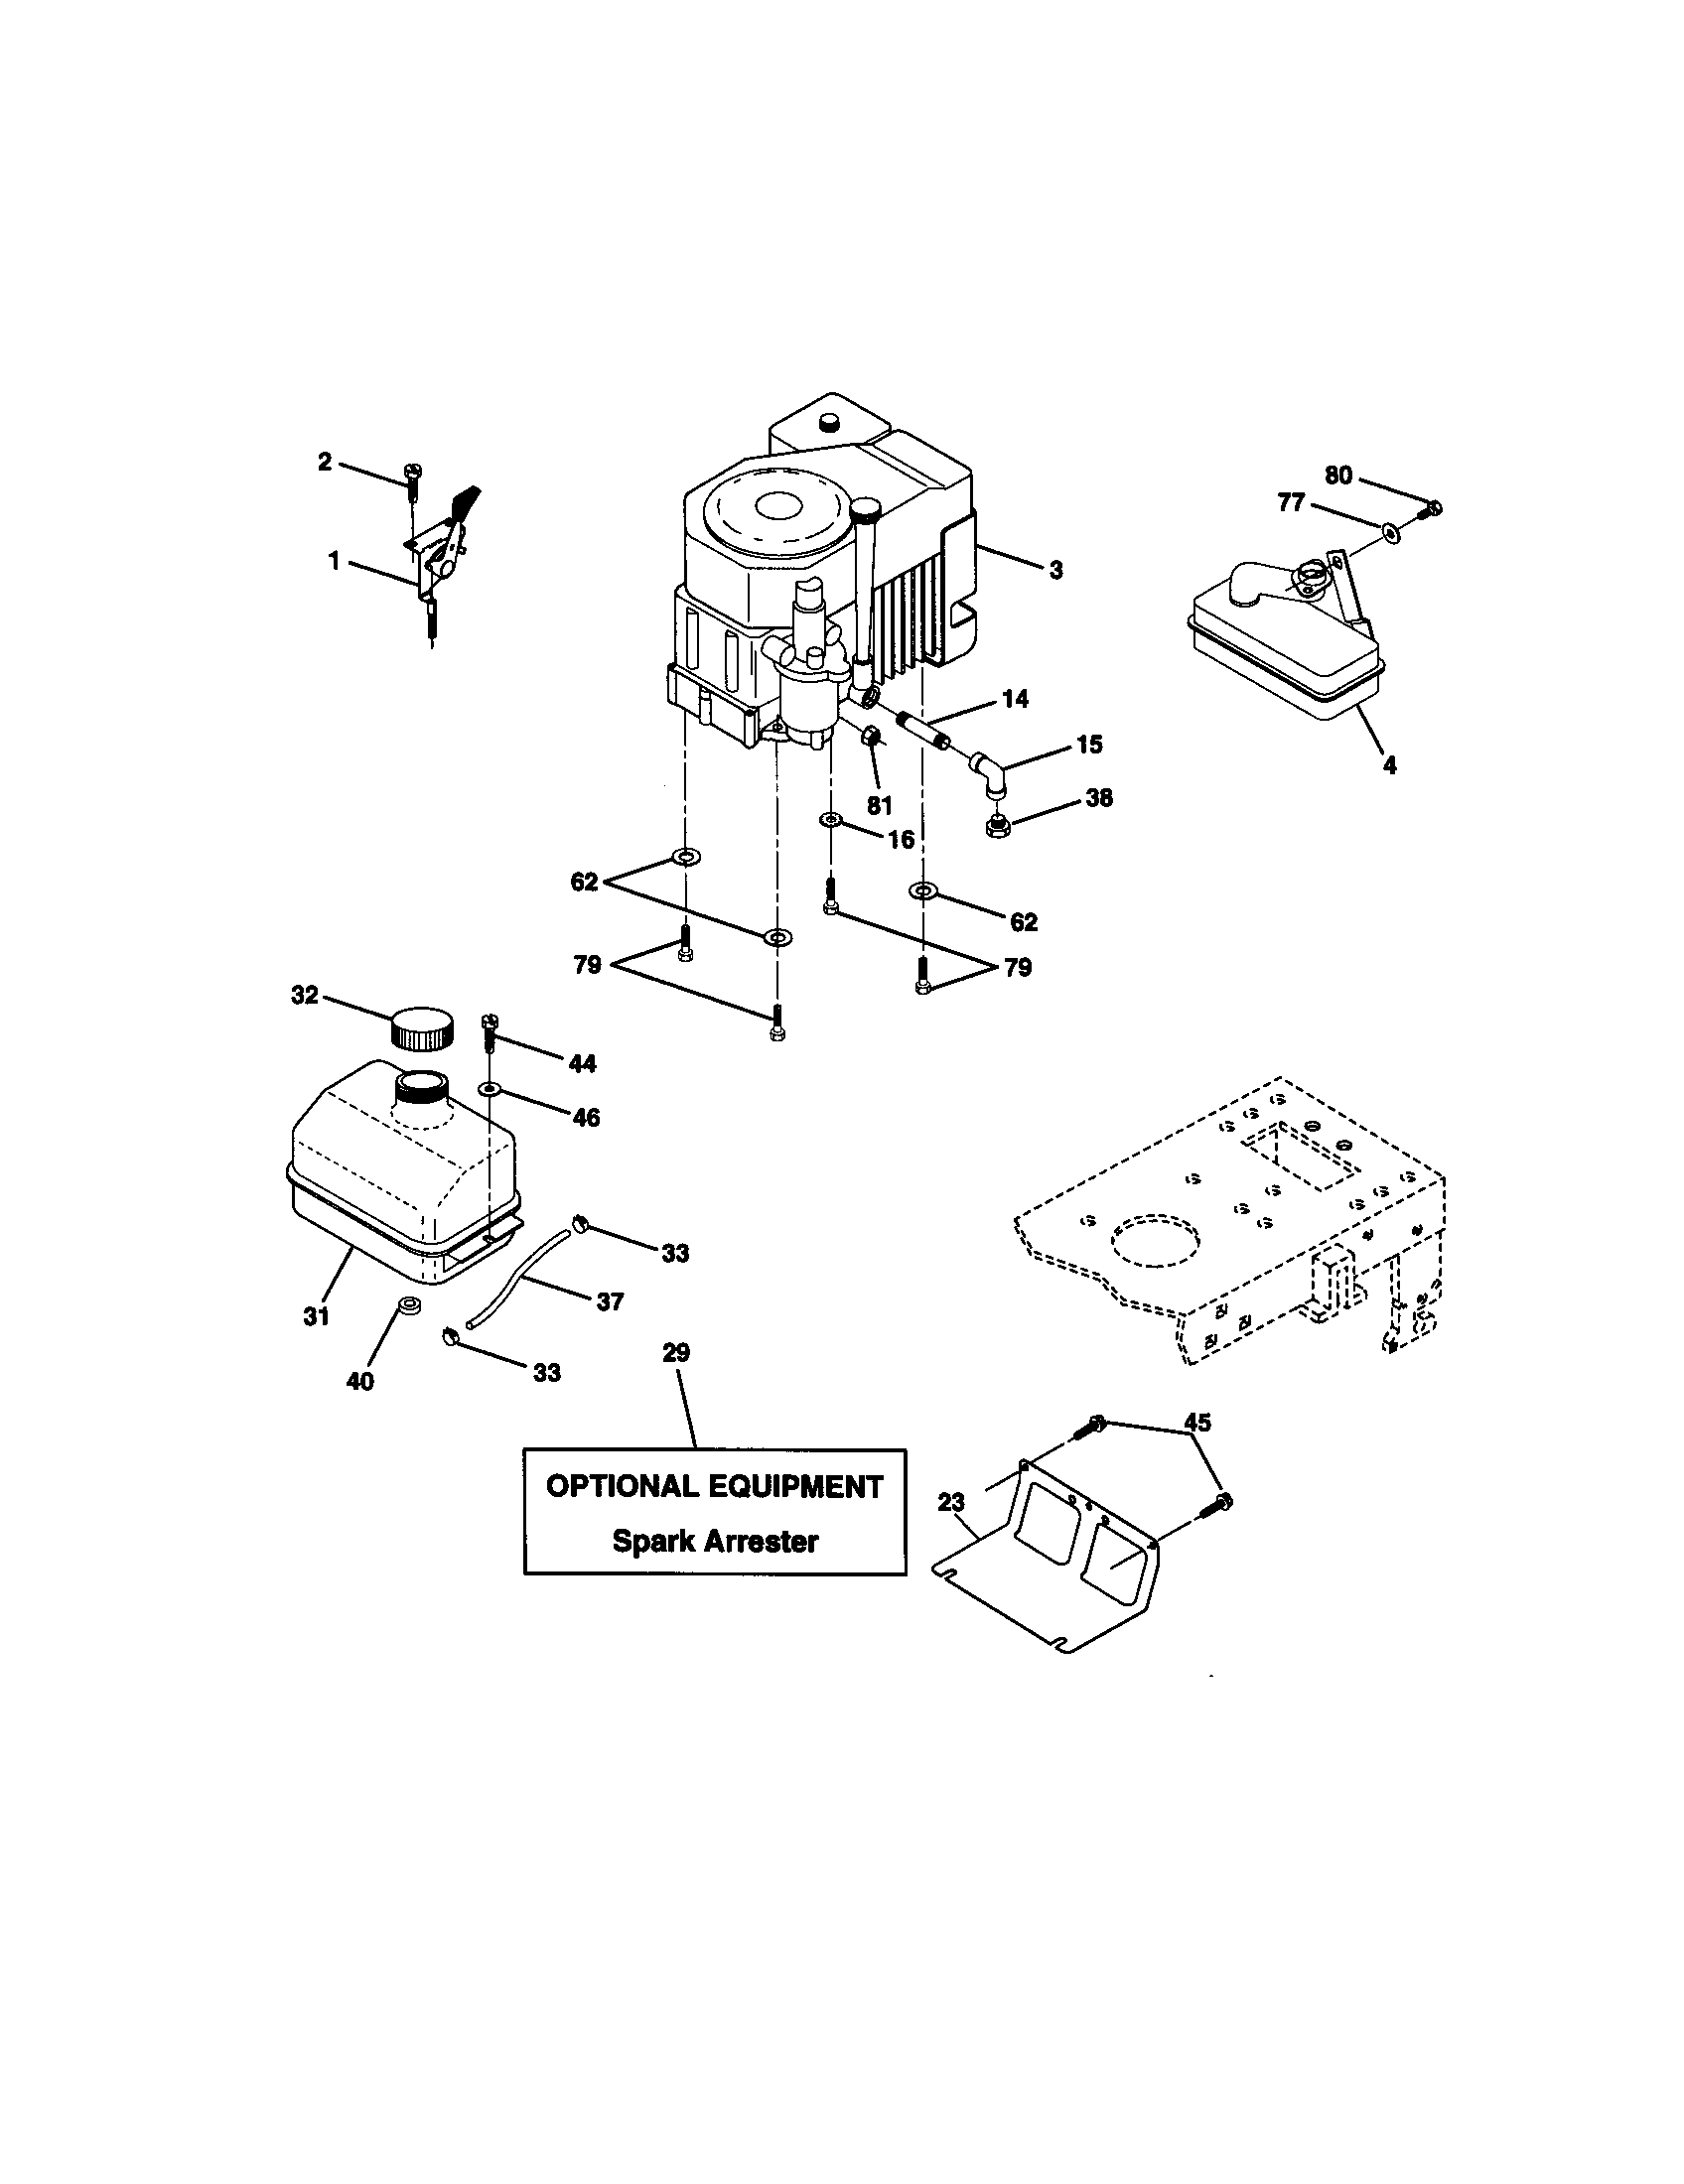 Craftsman craftsman 15 5hp 42 automatic lawn tractor parts model 917271060 sears partsdirect